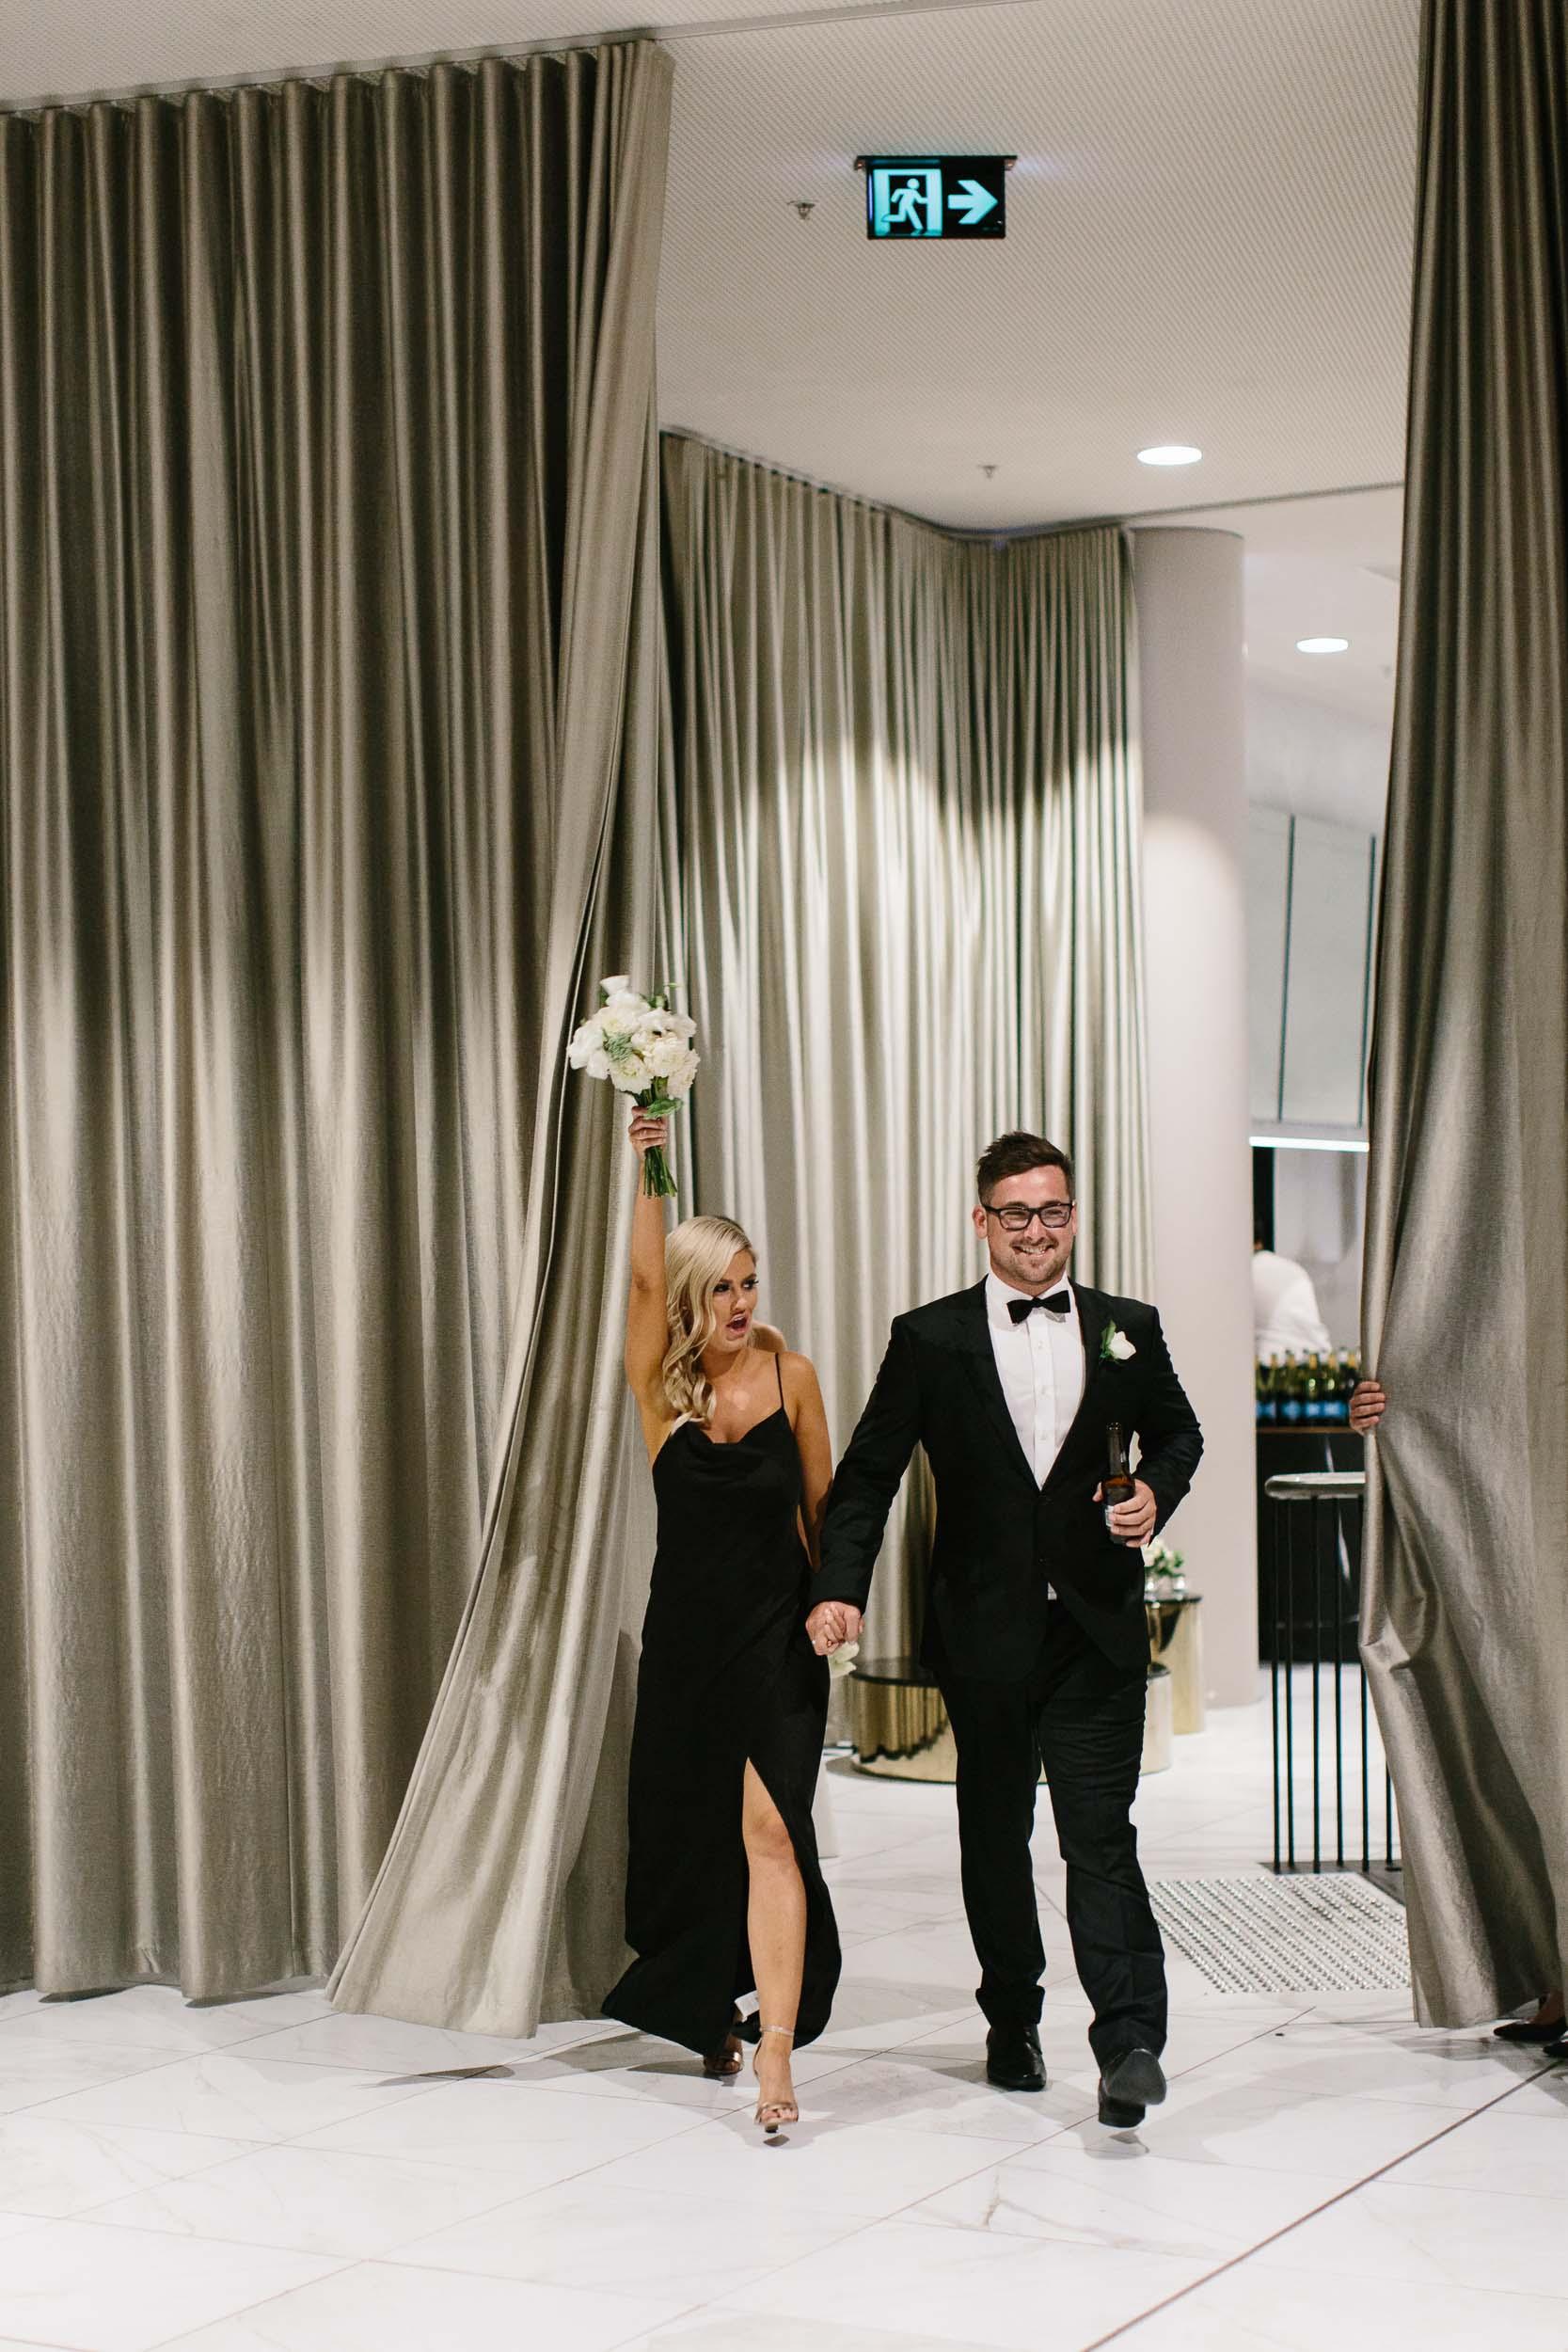 Kas-Richards-Melbourne-Garden-Wedding-Aerial-South-Whark-Georgia-Young-Couture-464.jpg